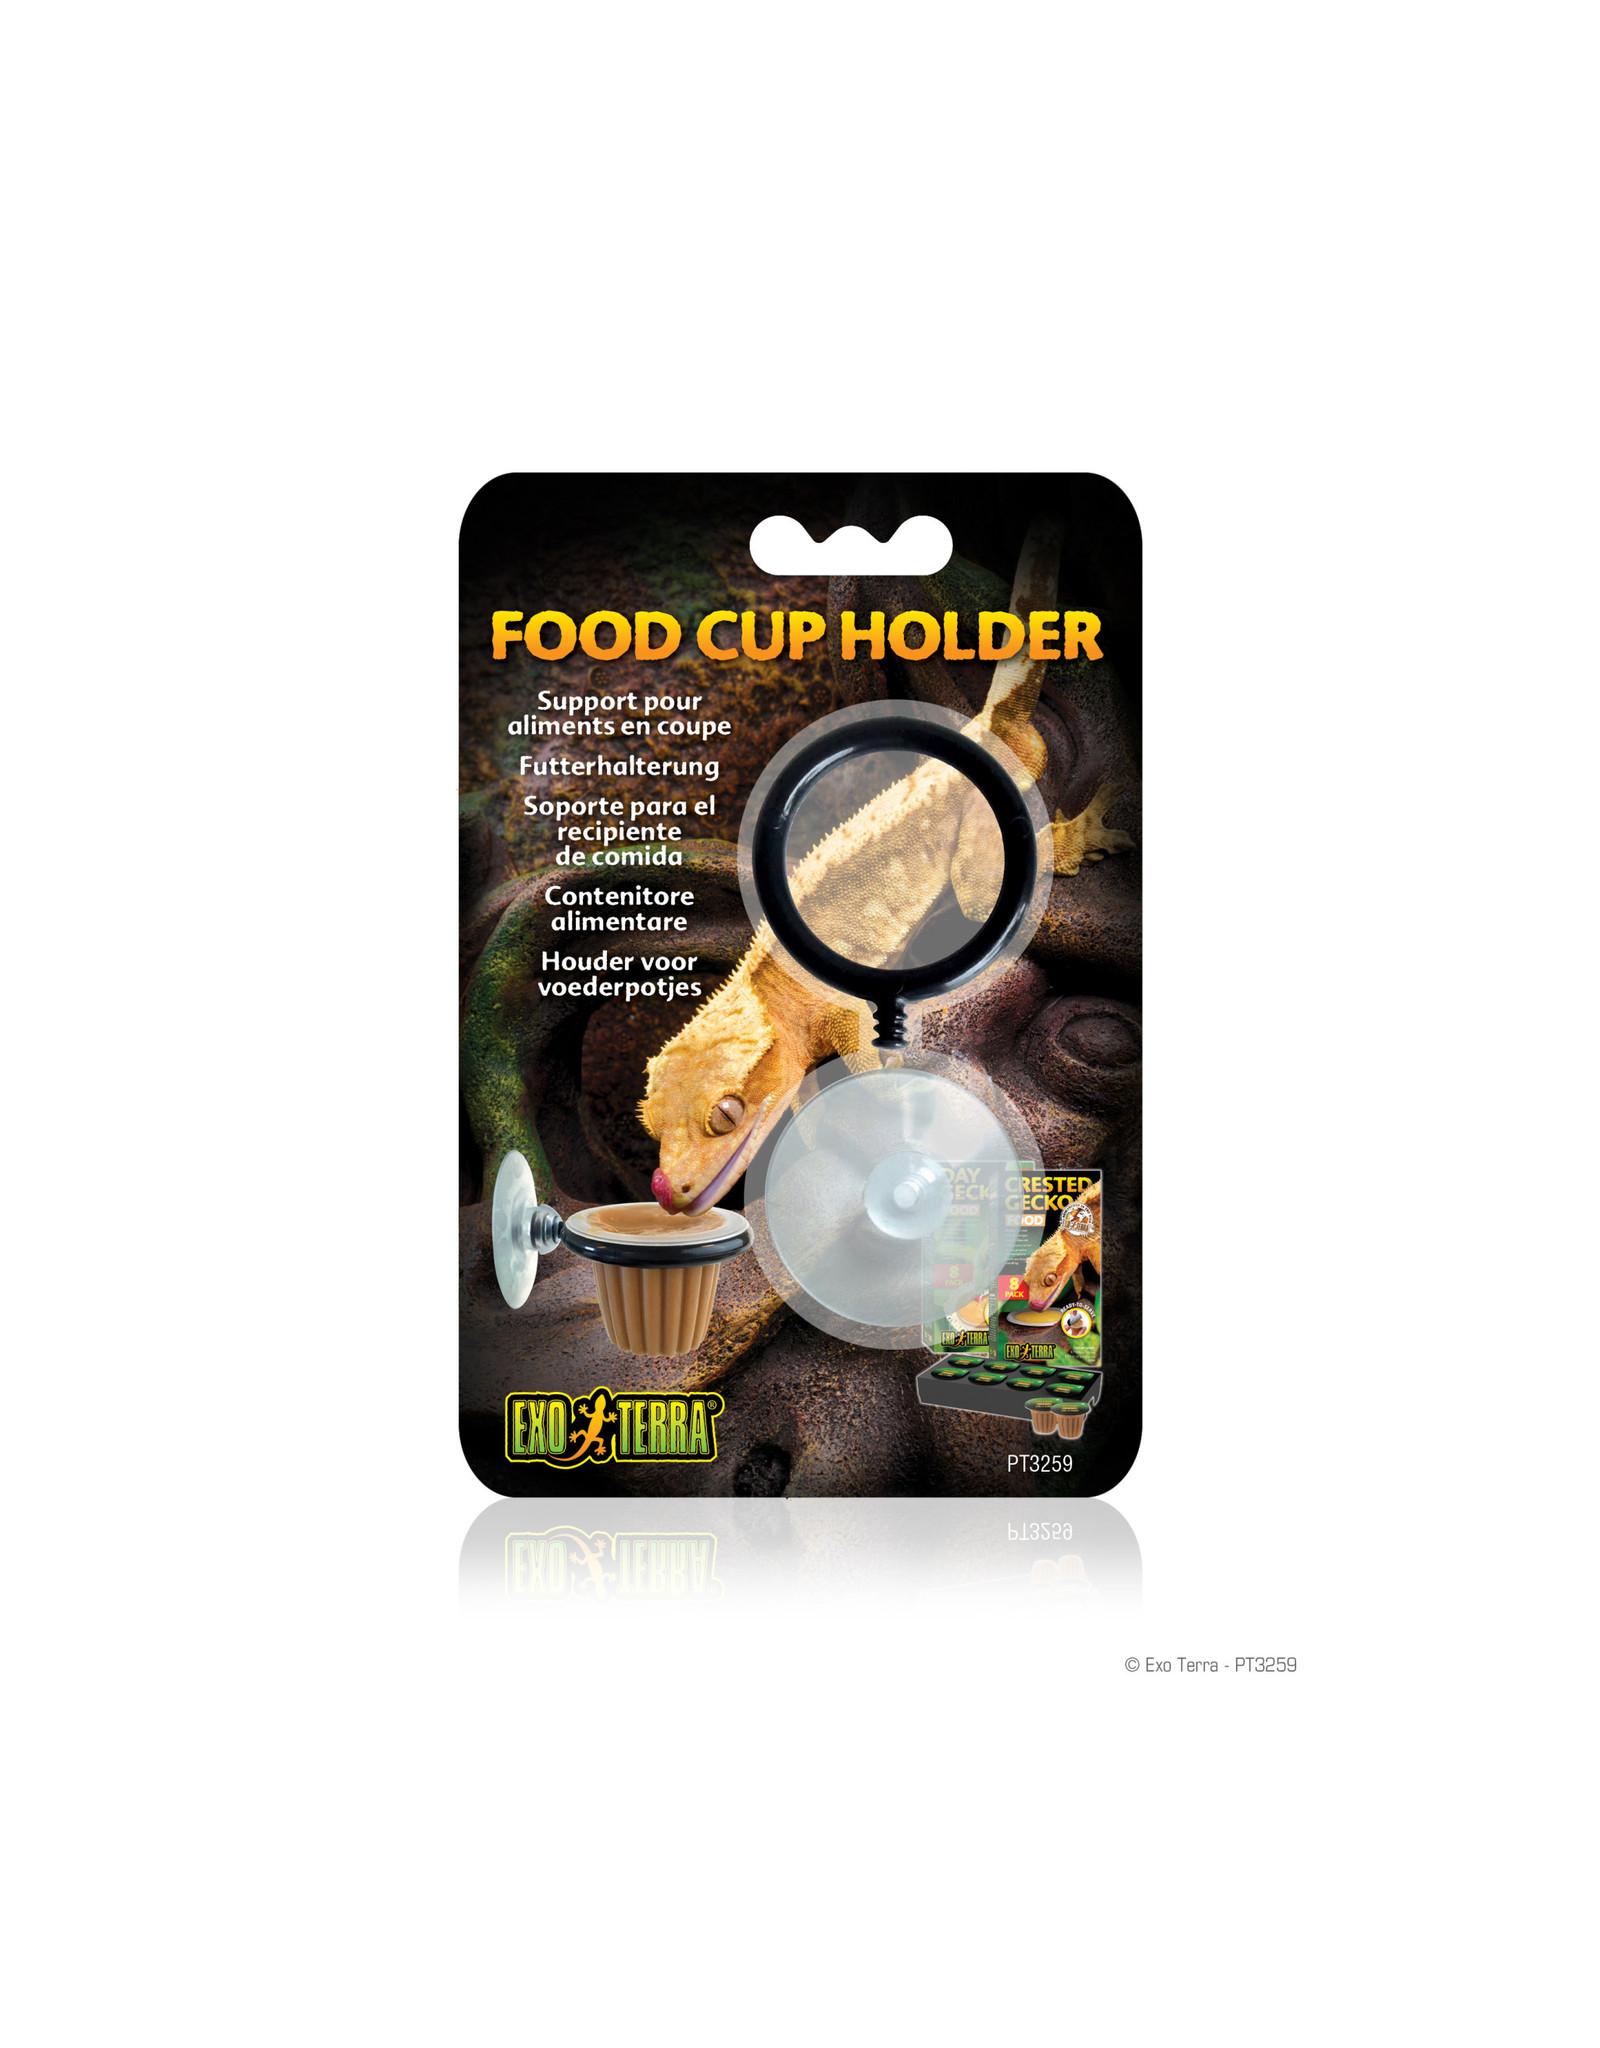 Exo Terra Food Cup Holder